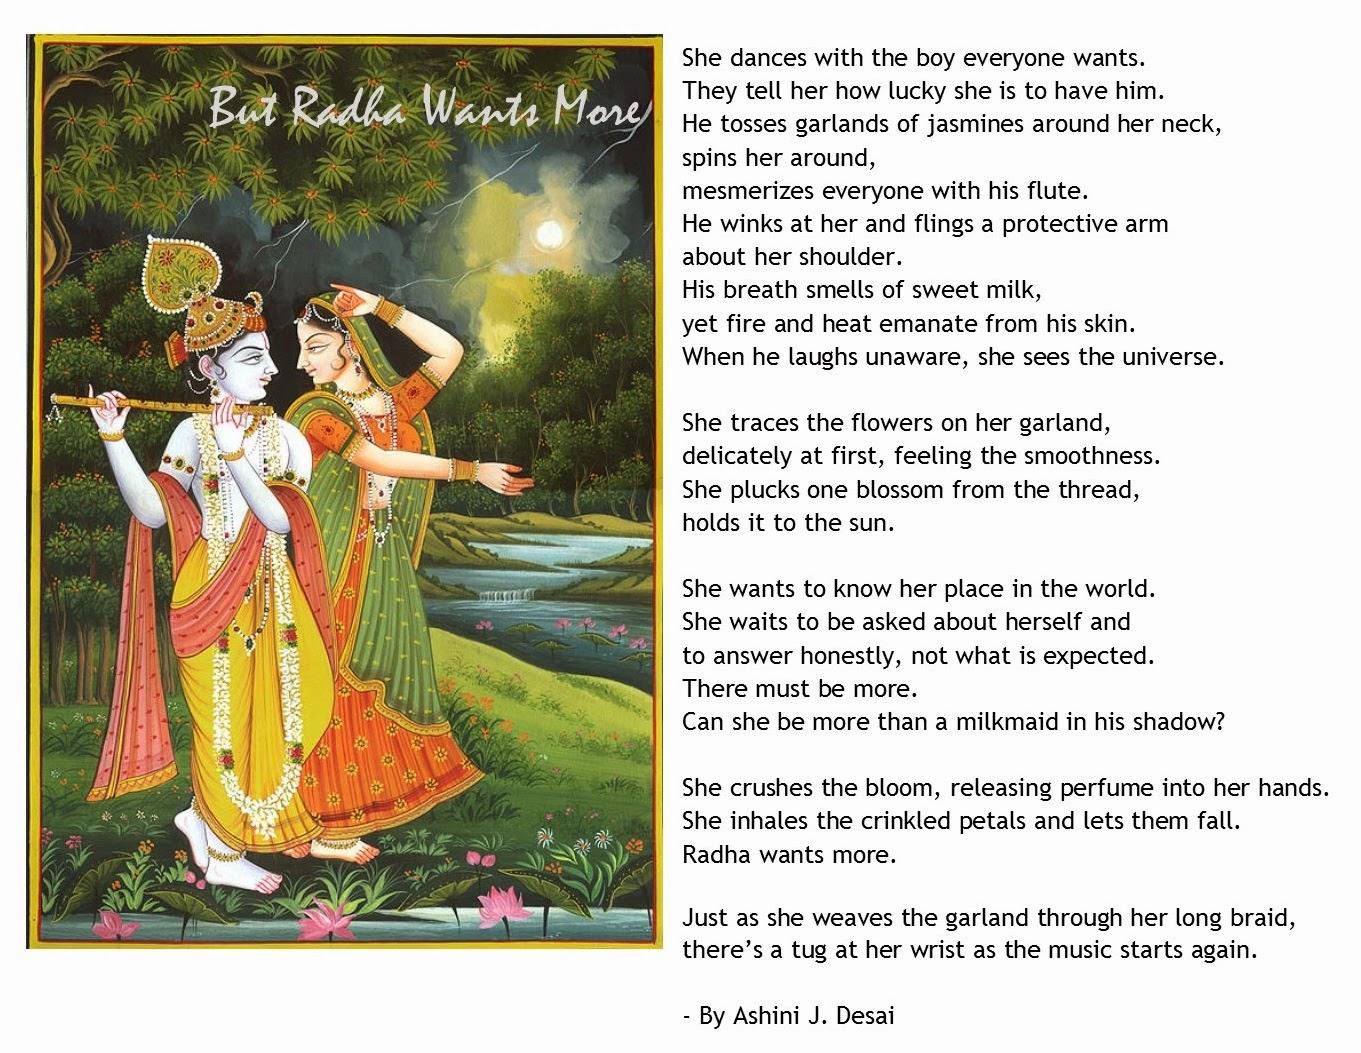 draupadi and krishna relationship poems